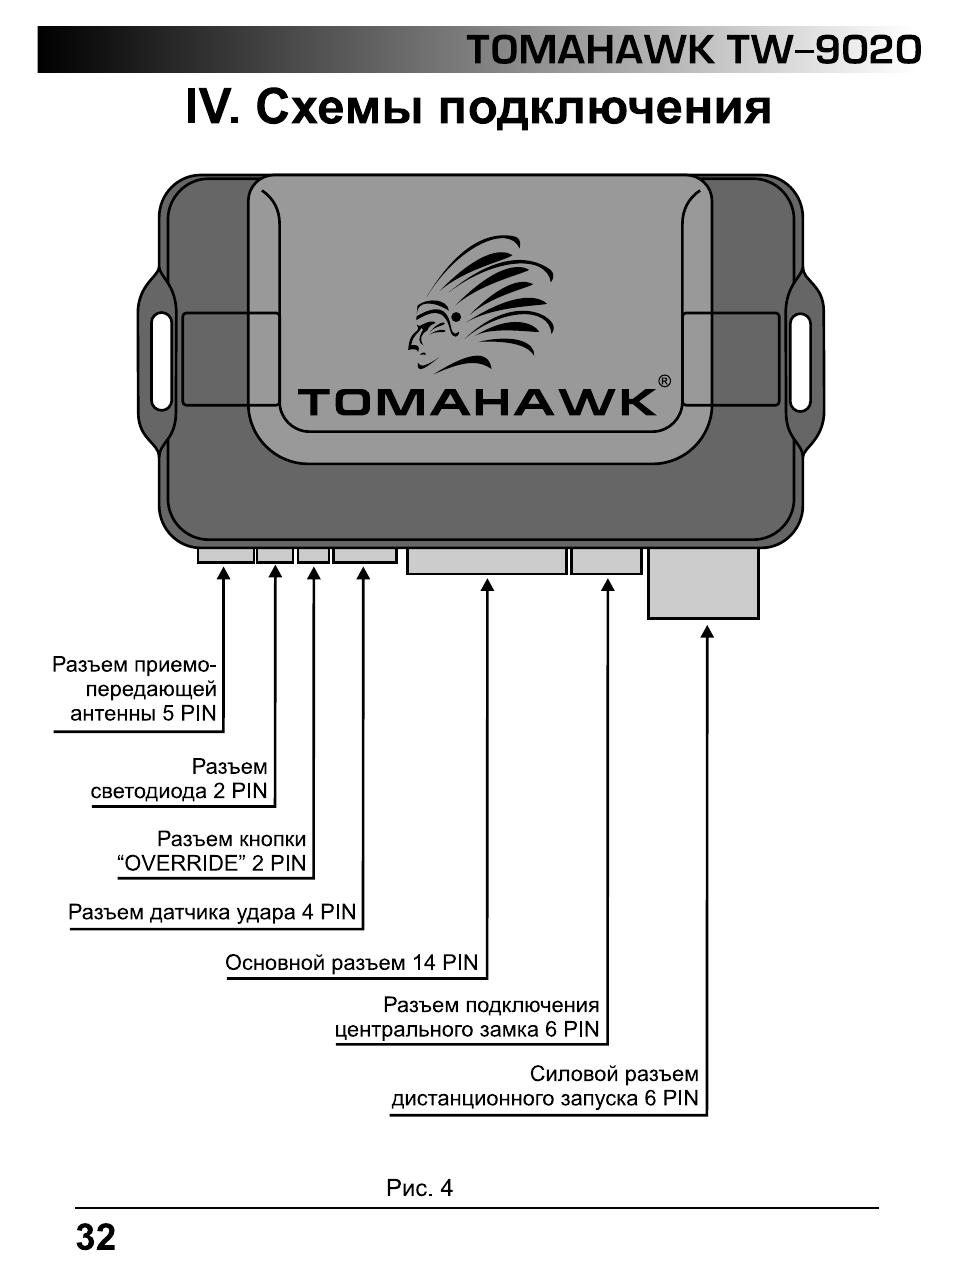 Подключение автосигнализации томагавк своими руками 39